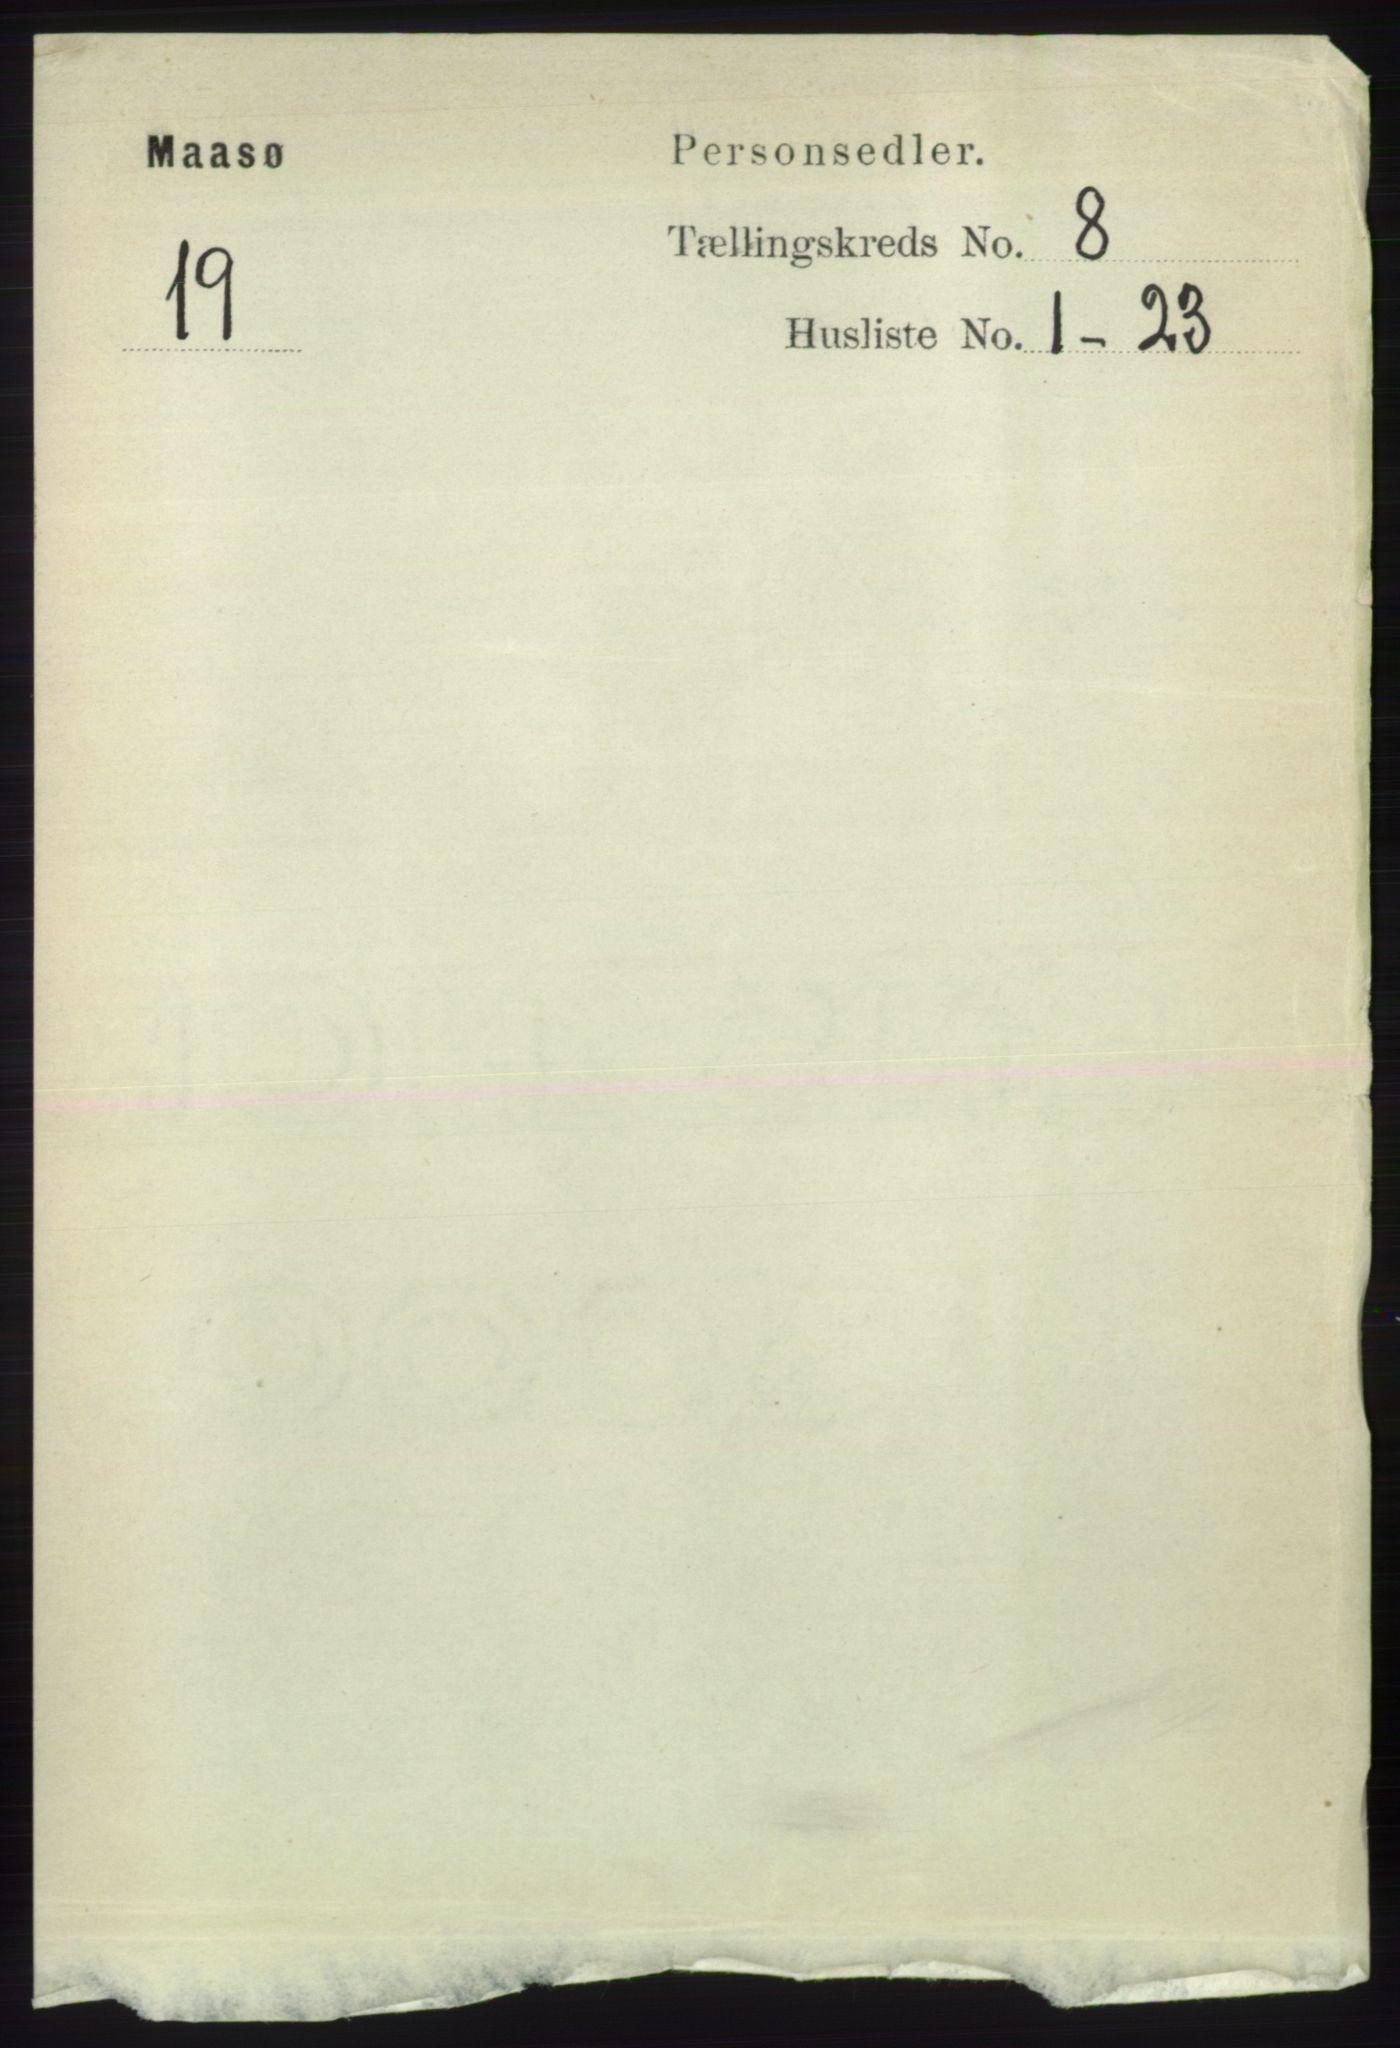 RA, Folketelling 1891 for 2018 Måsøy herred, 1891, s. 1521